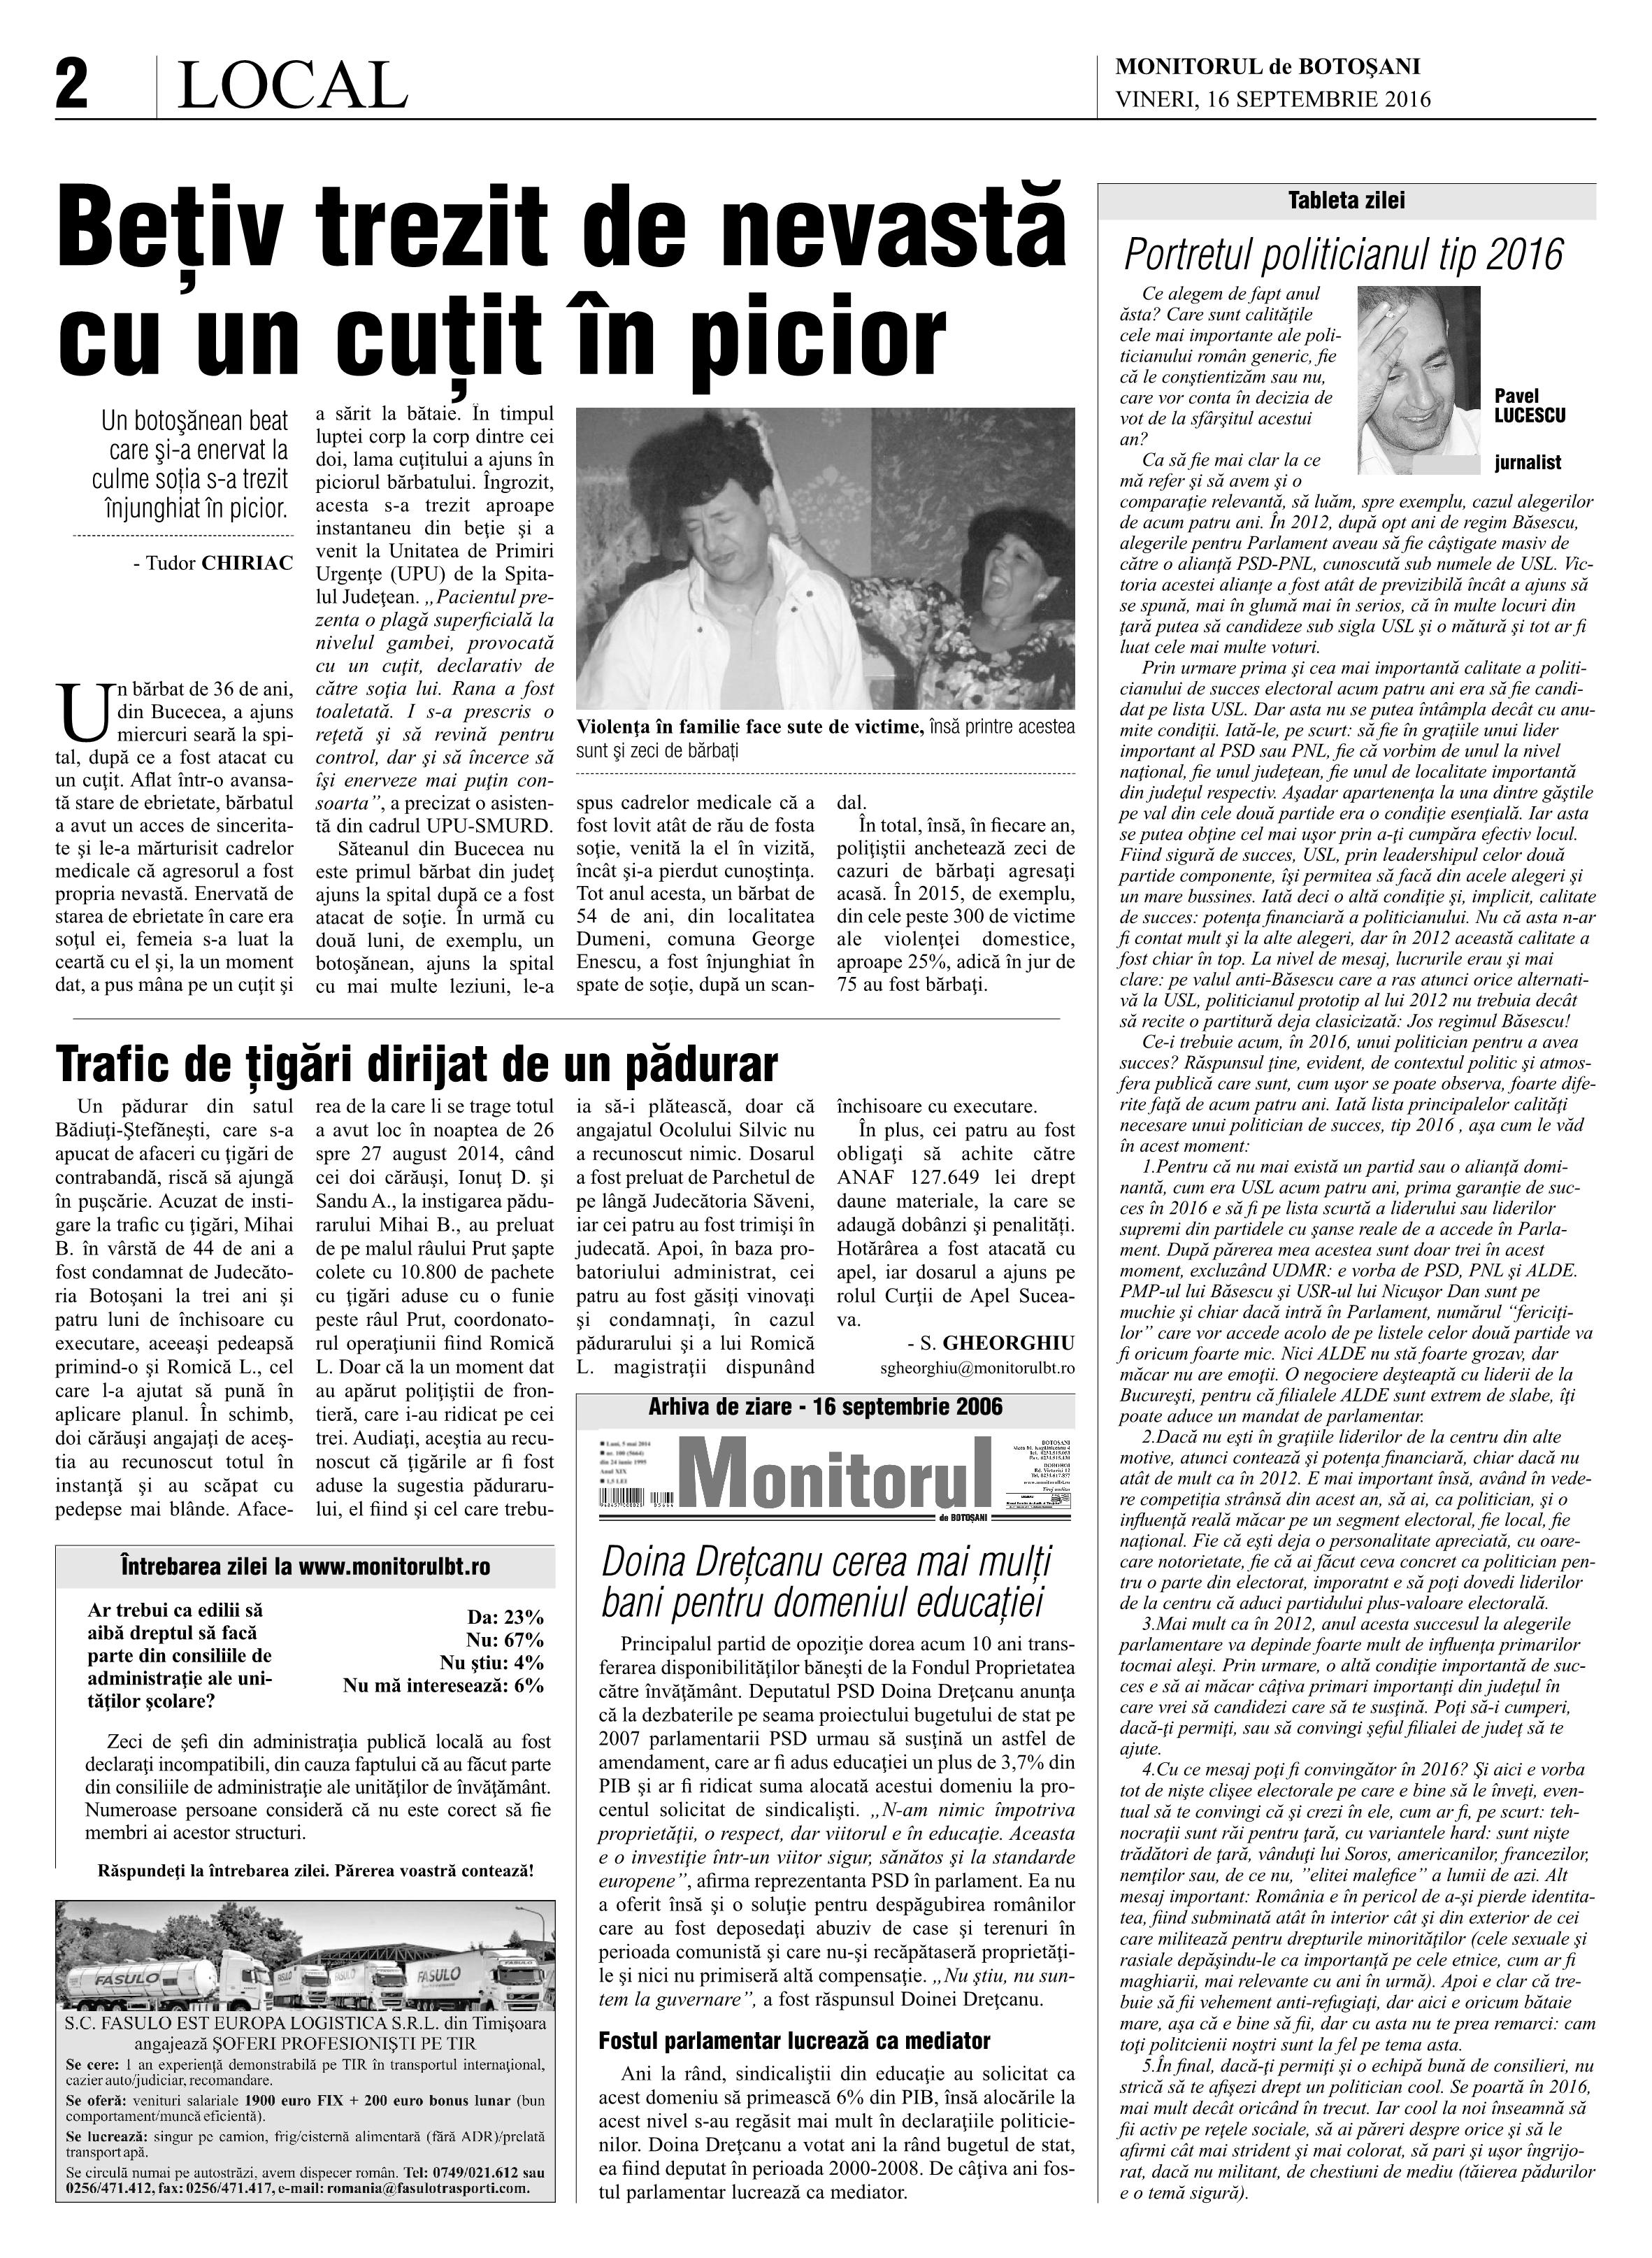 testul papanicolau | Forumul Medical ROmedic